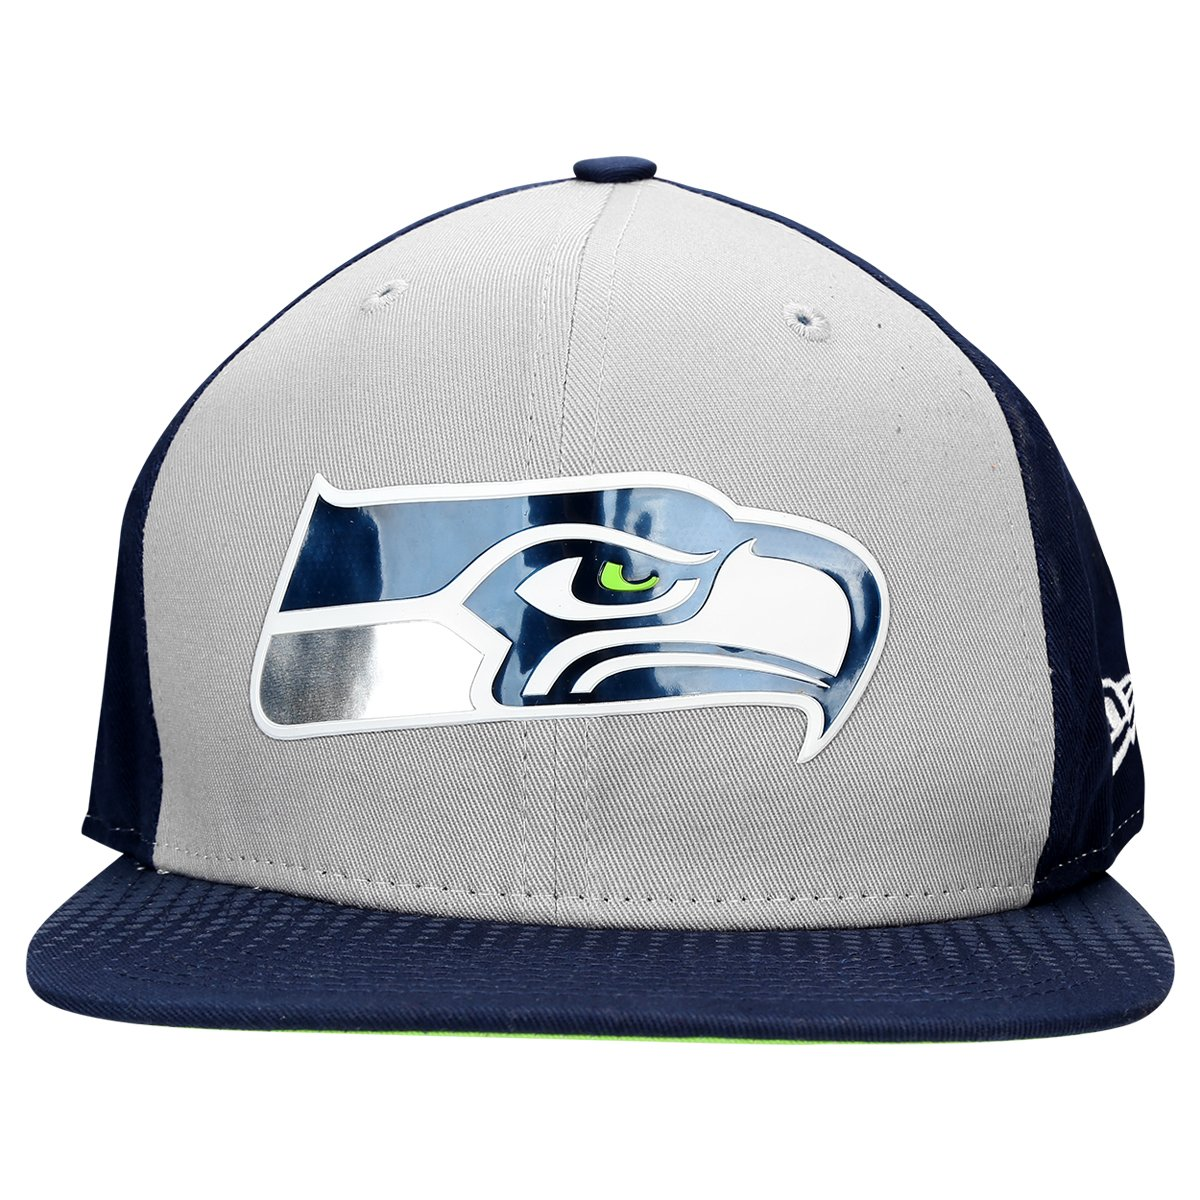 09c5bc7bd Boné New Era NFL 950 Draft Colletion Seattle Seahawks - Compre Agora ...